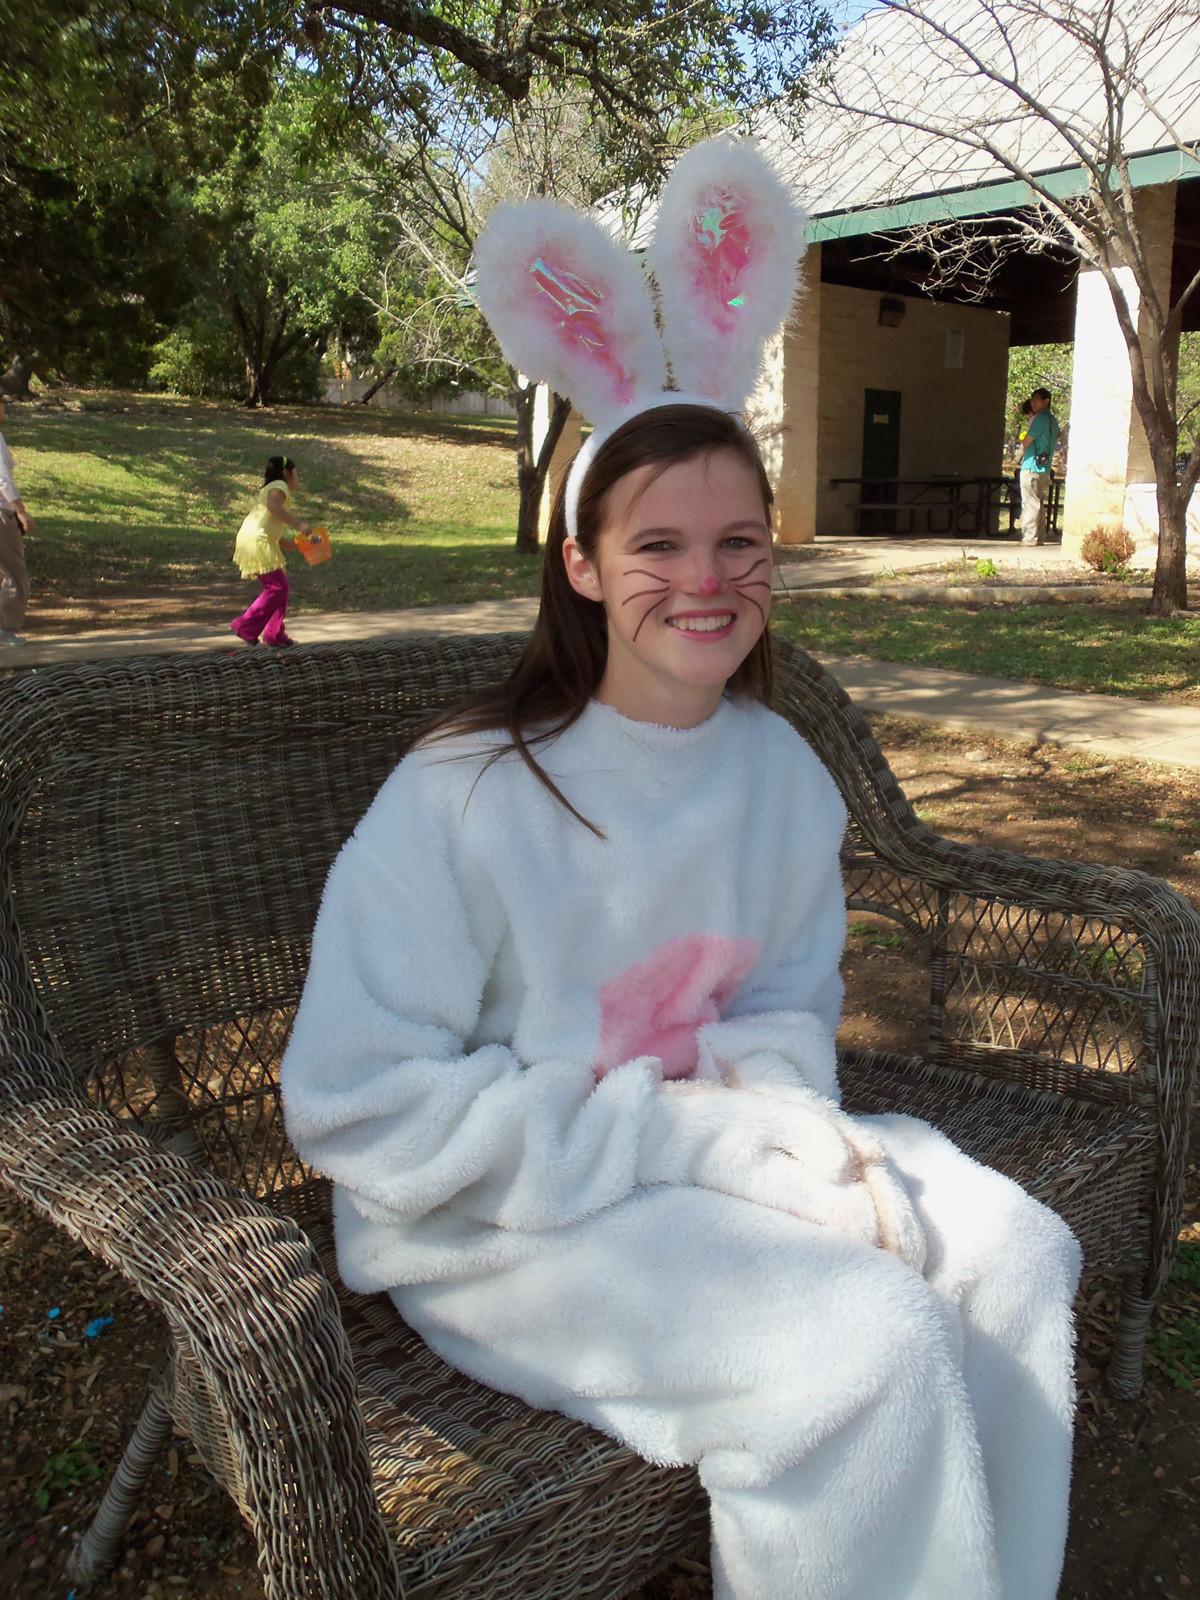 Dorie-&-Gene-provide-the-bunny-each-year